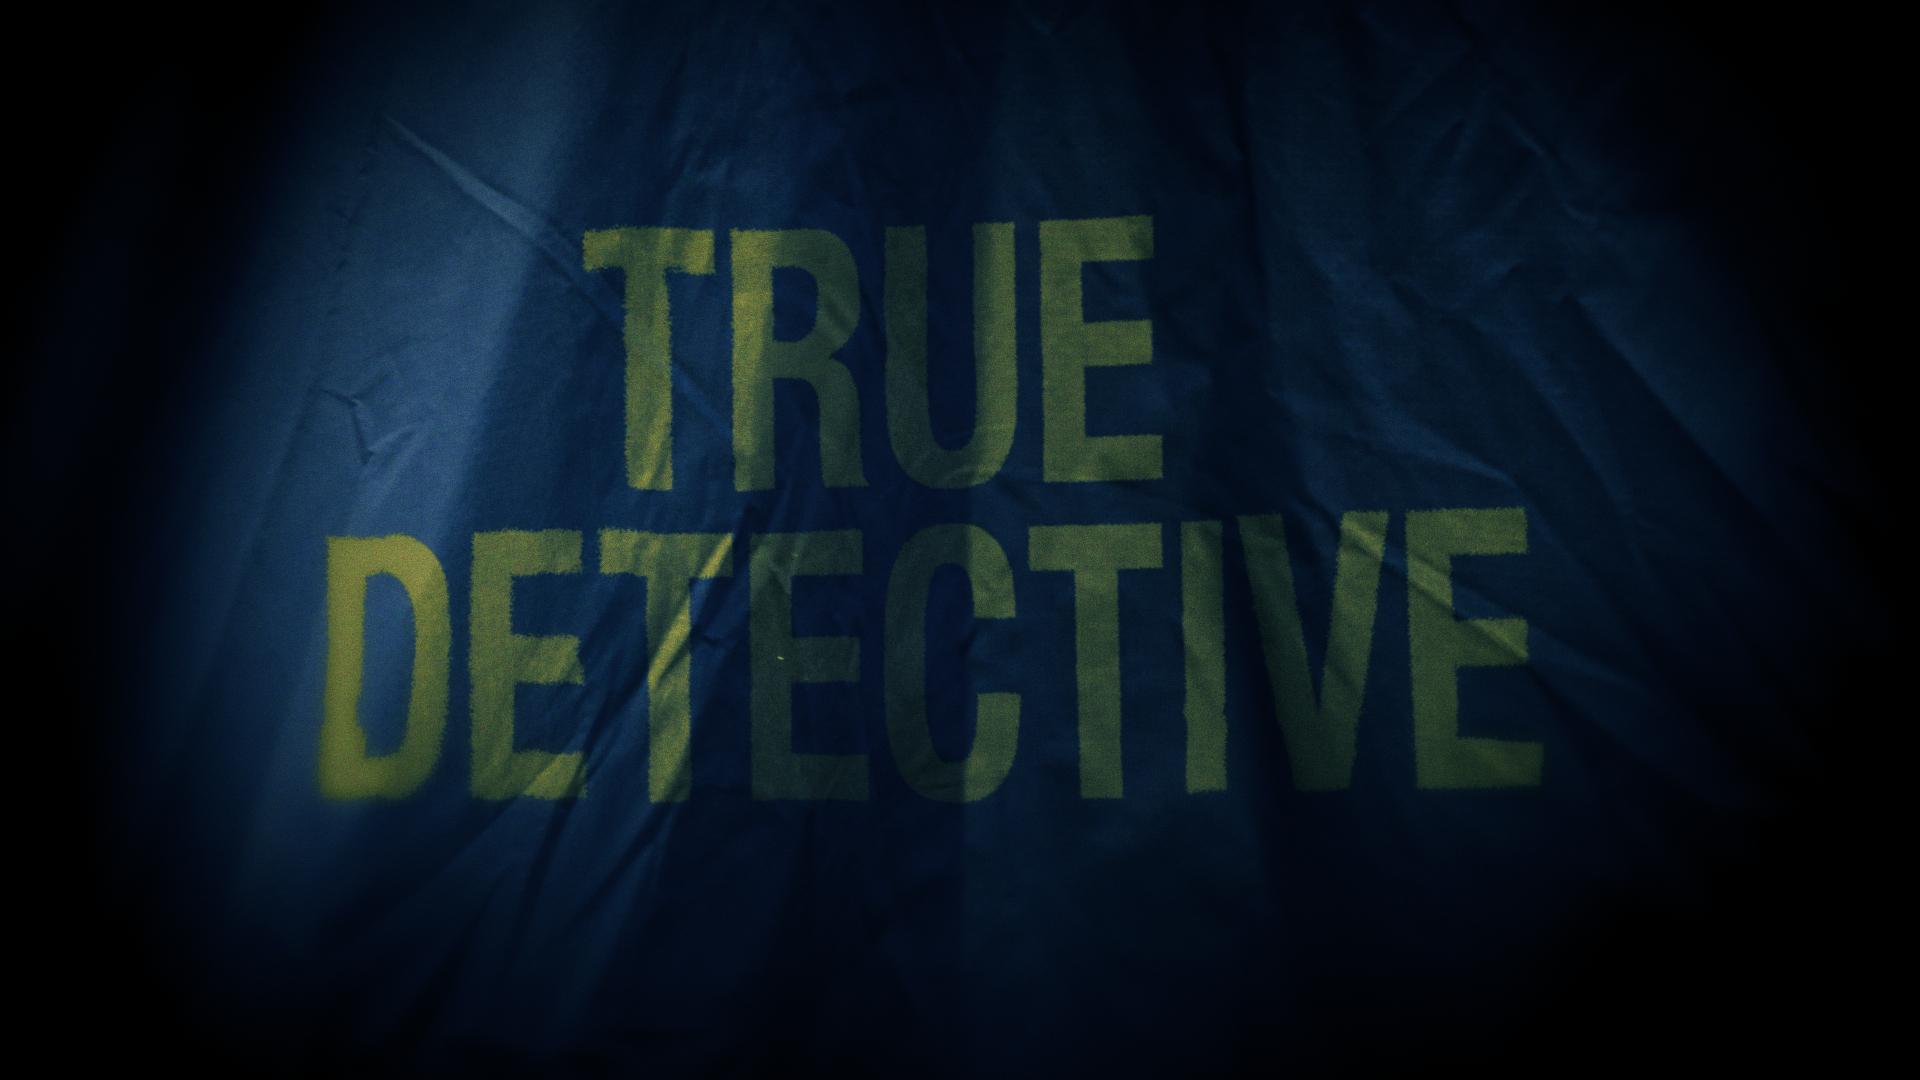 True Detective wallpaper 7